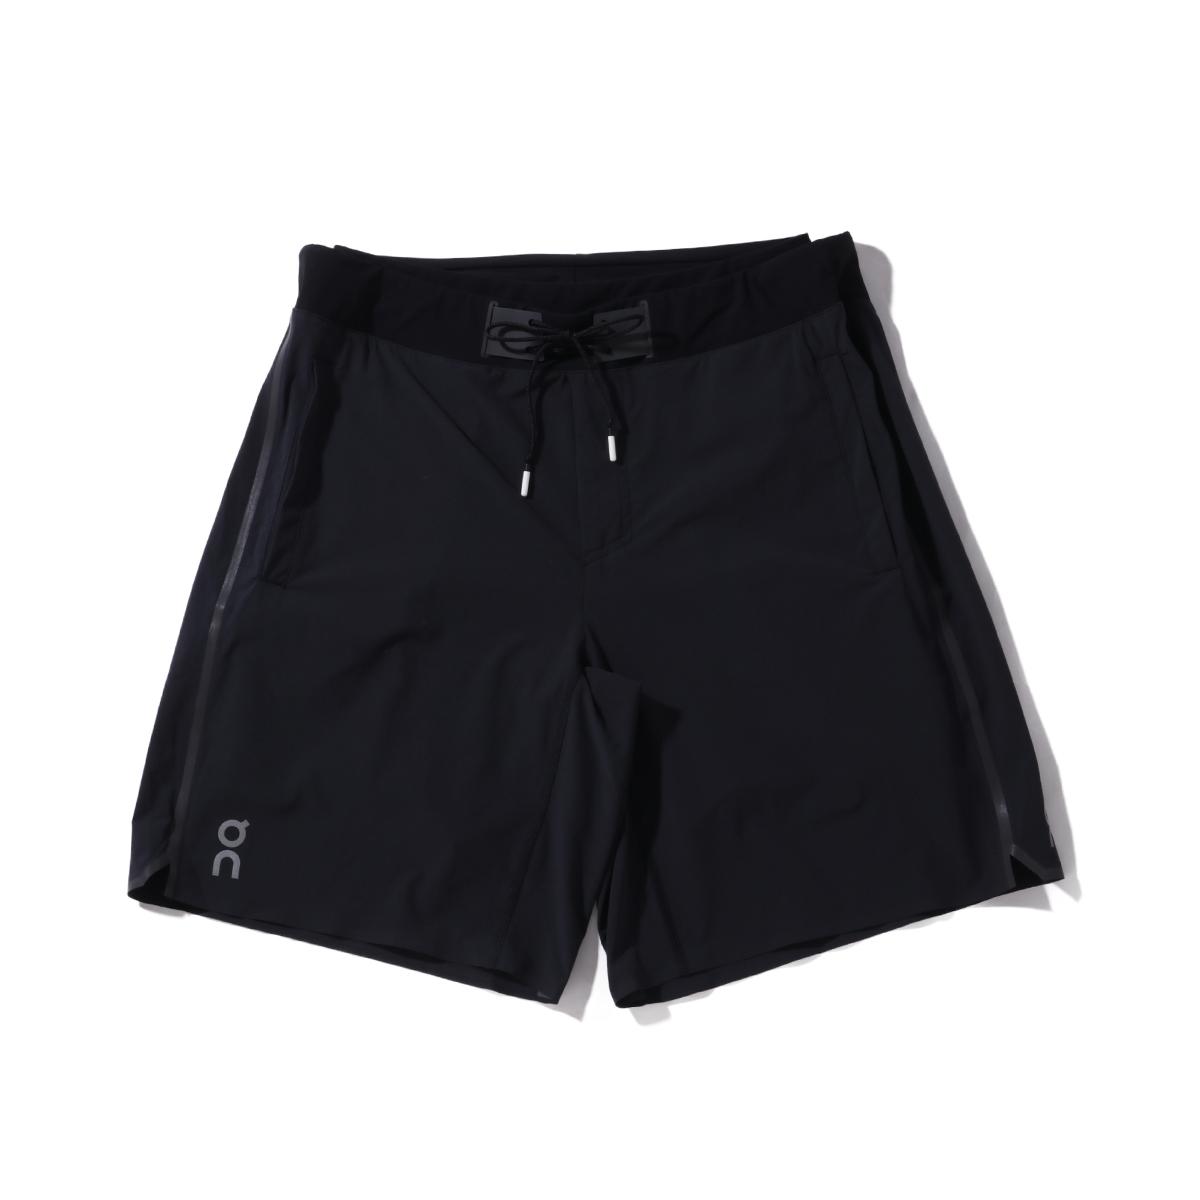 On Hybrid Shorts(オン ハイブリッド ショーツ)Black【メンズ ハーフパンツ】19FW-I